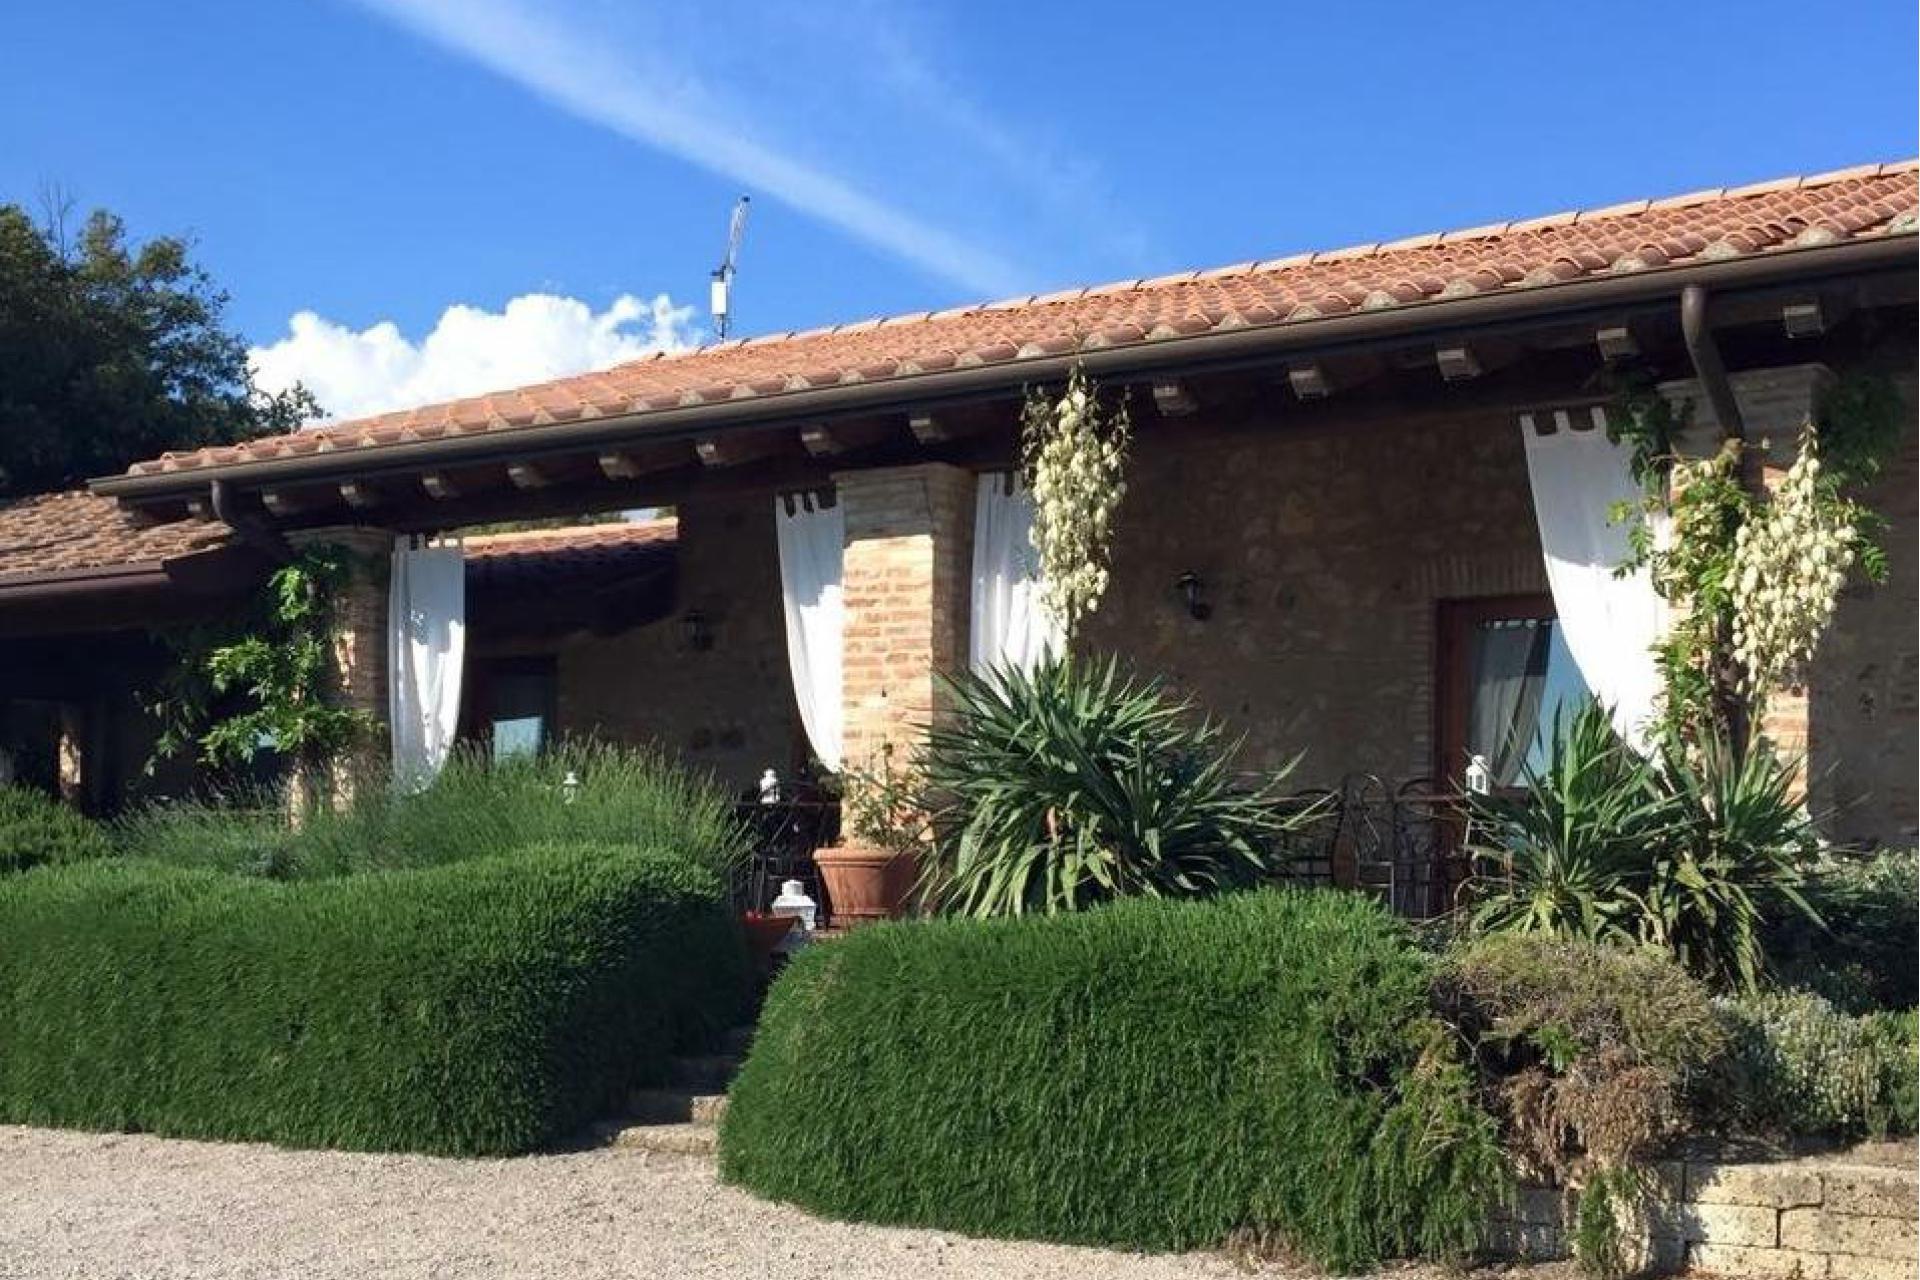 Agriturismo Tuscany Agriturismo between vineyards south of Siena